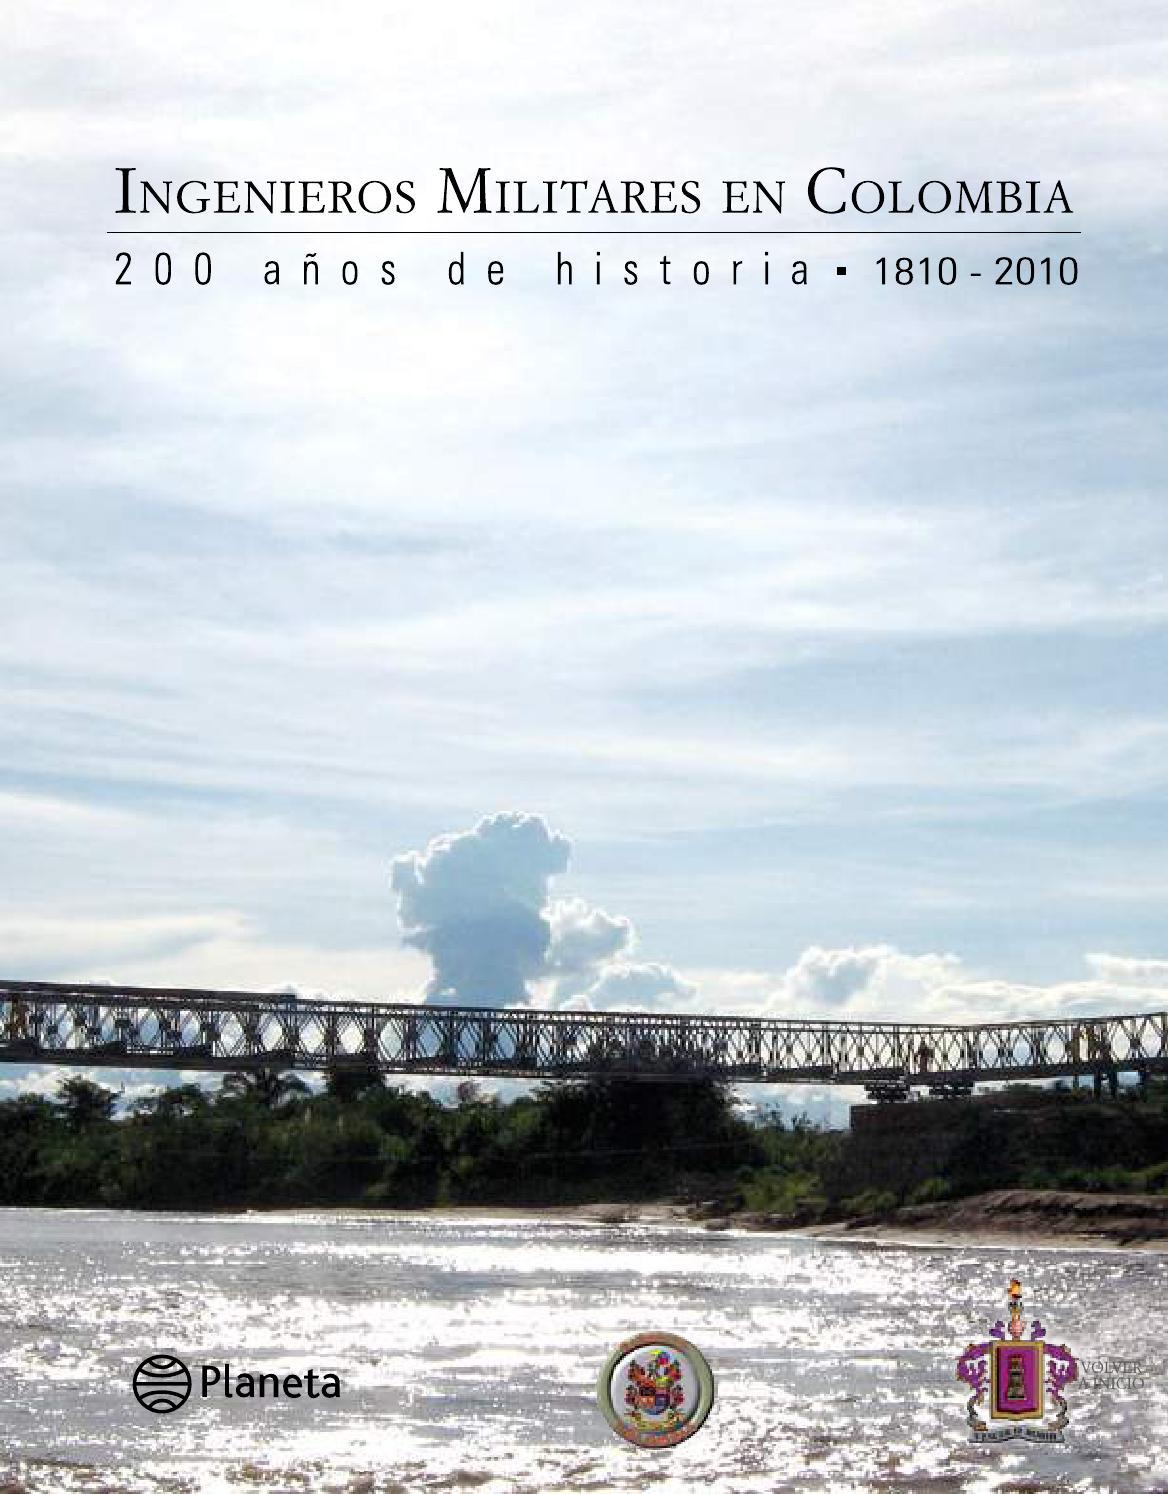 Ingenieros Militares En Colombia 200 A Os De Historia 1810 2010  # Muebles Ferreira Buga